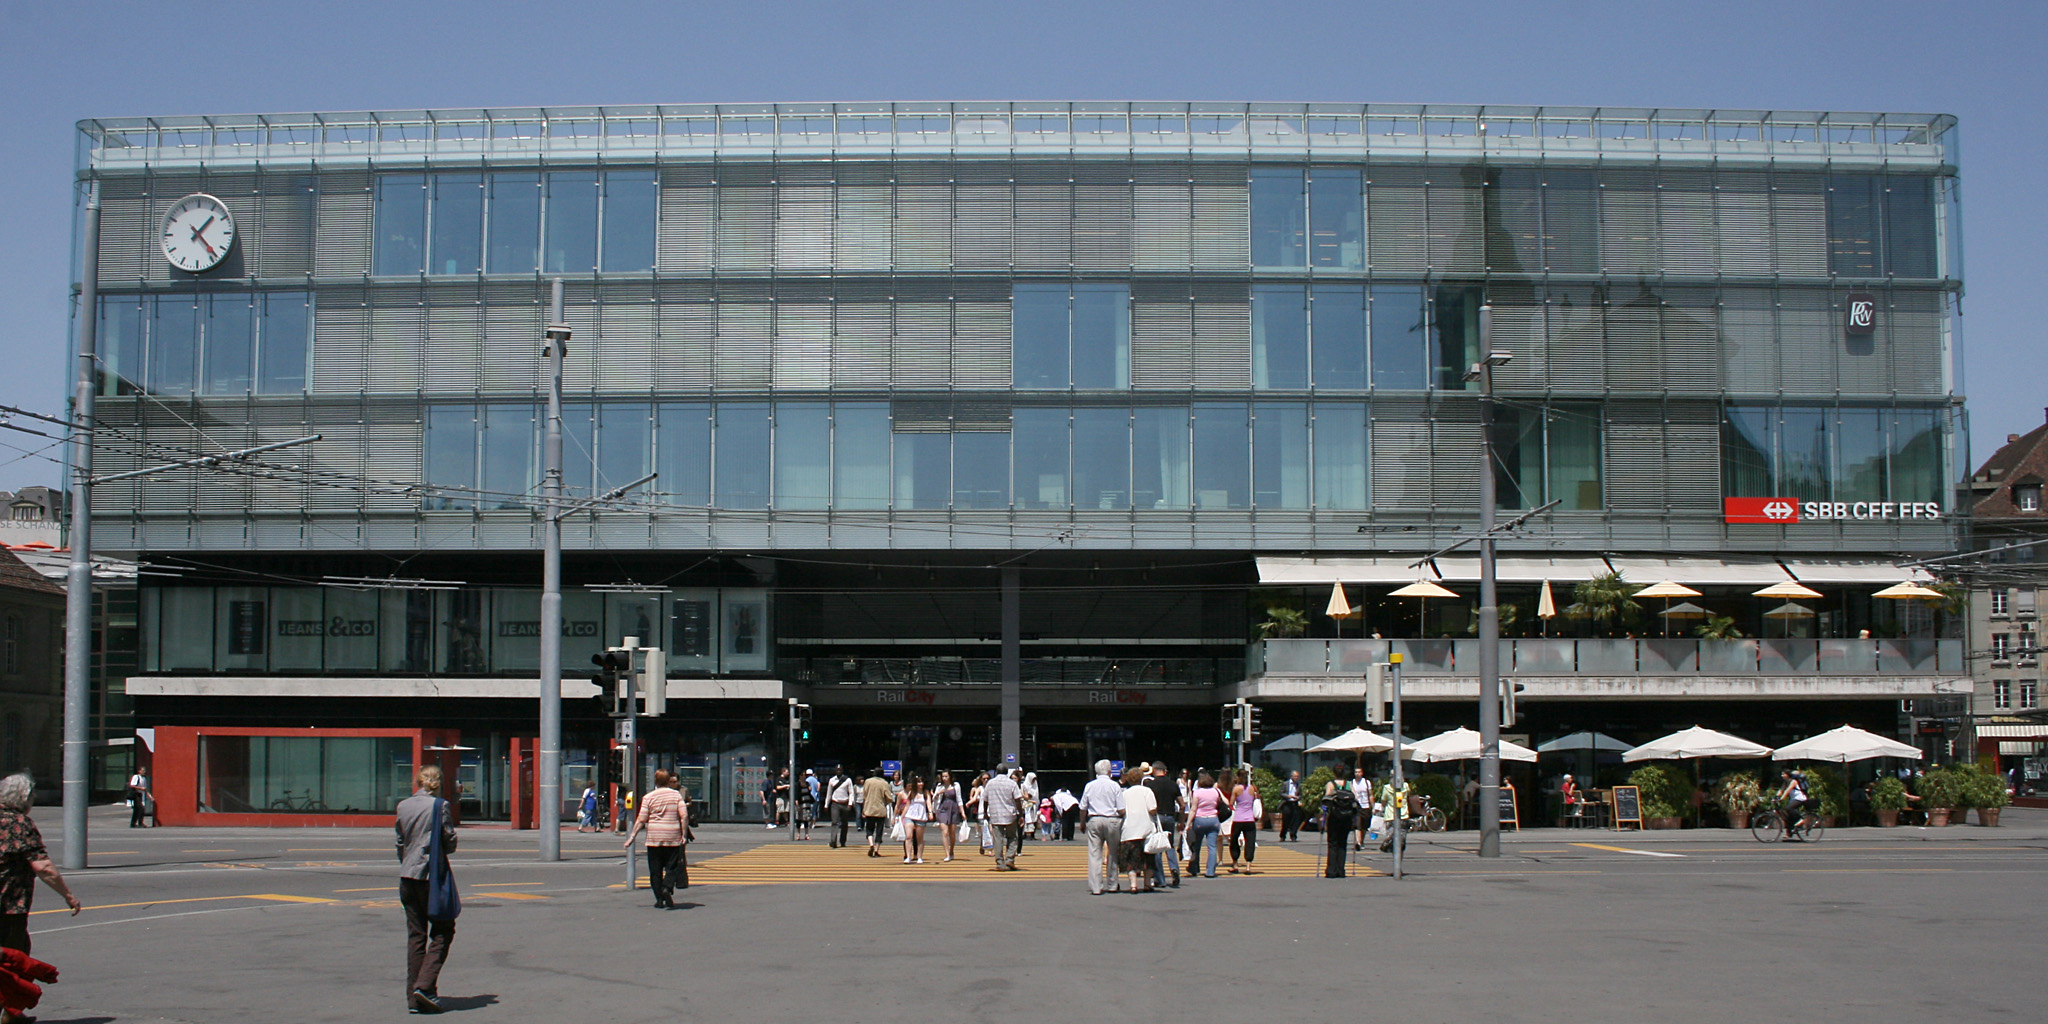 Estación de Berna (Suiza)